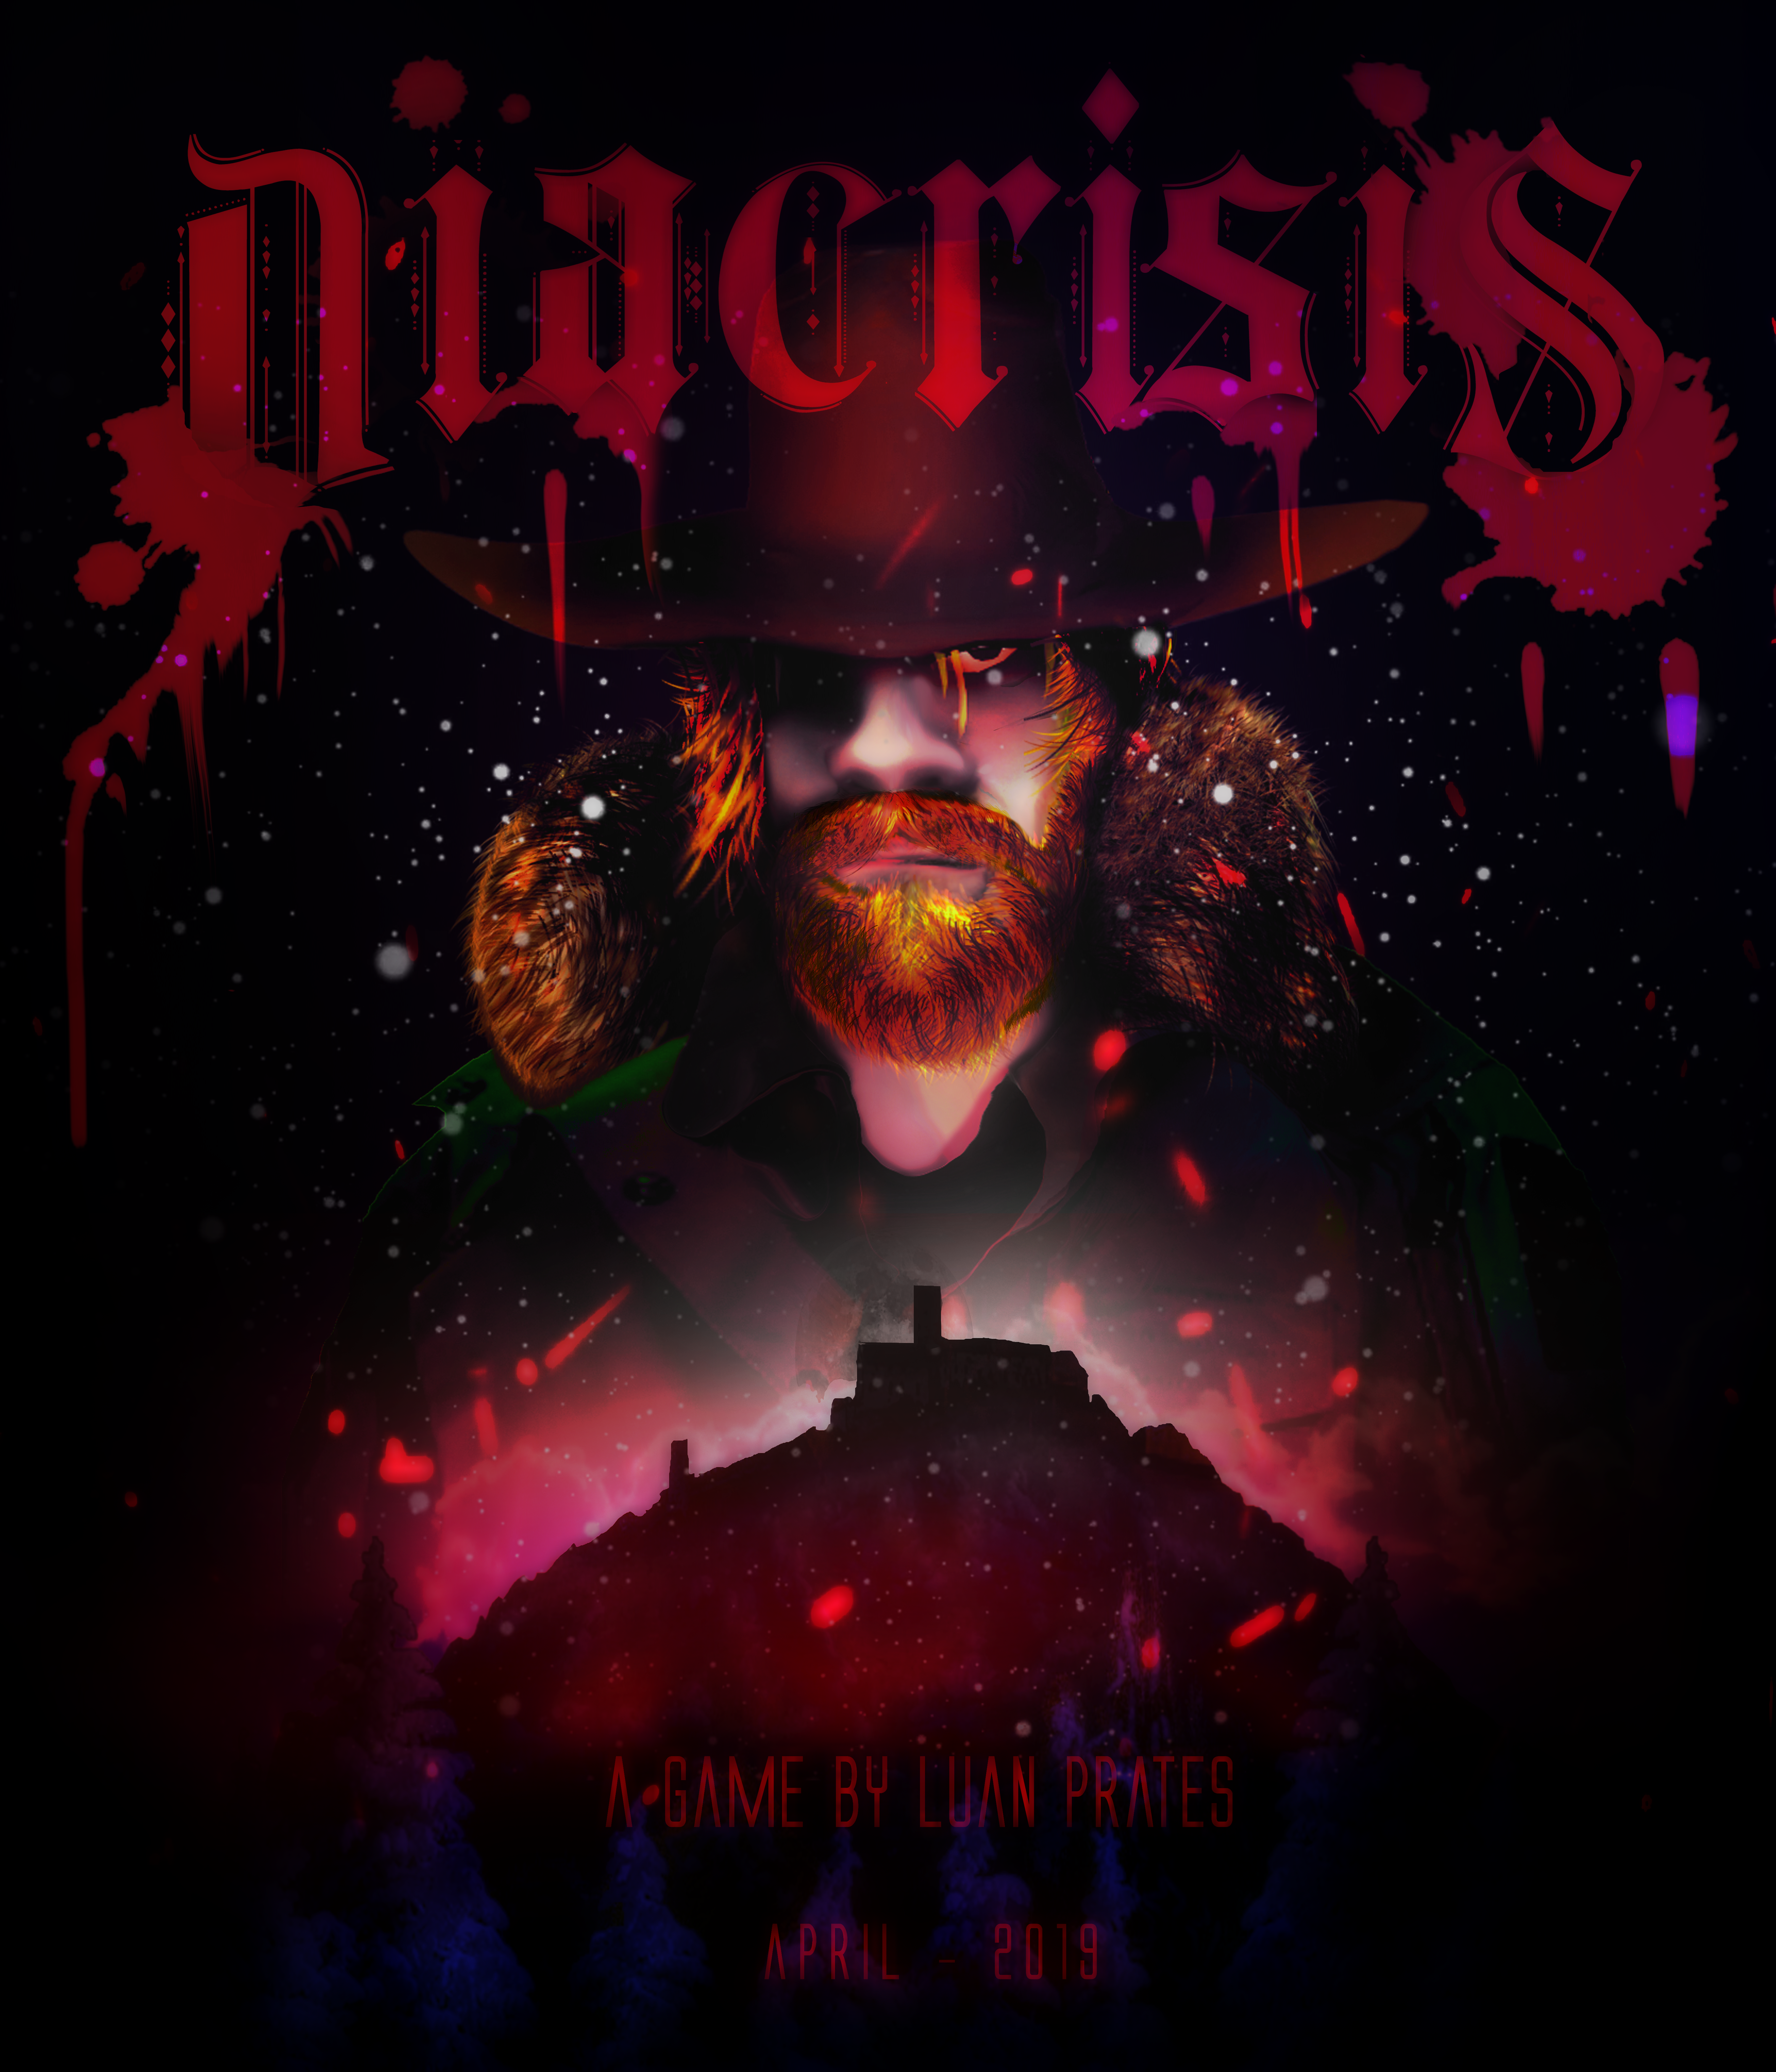 Diacrisis Cover